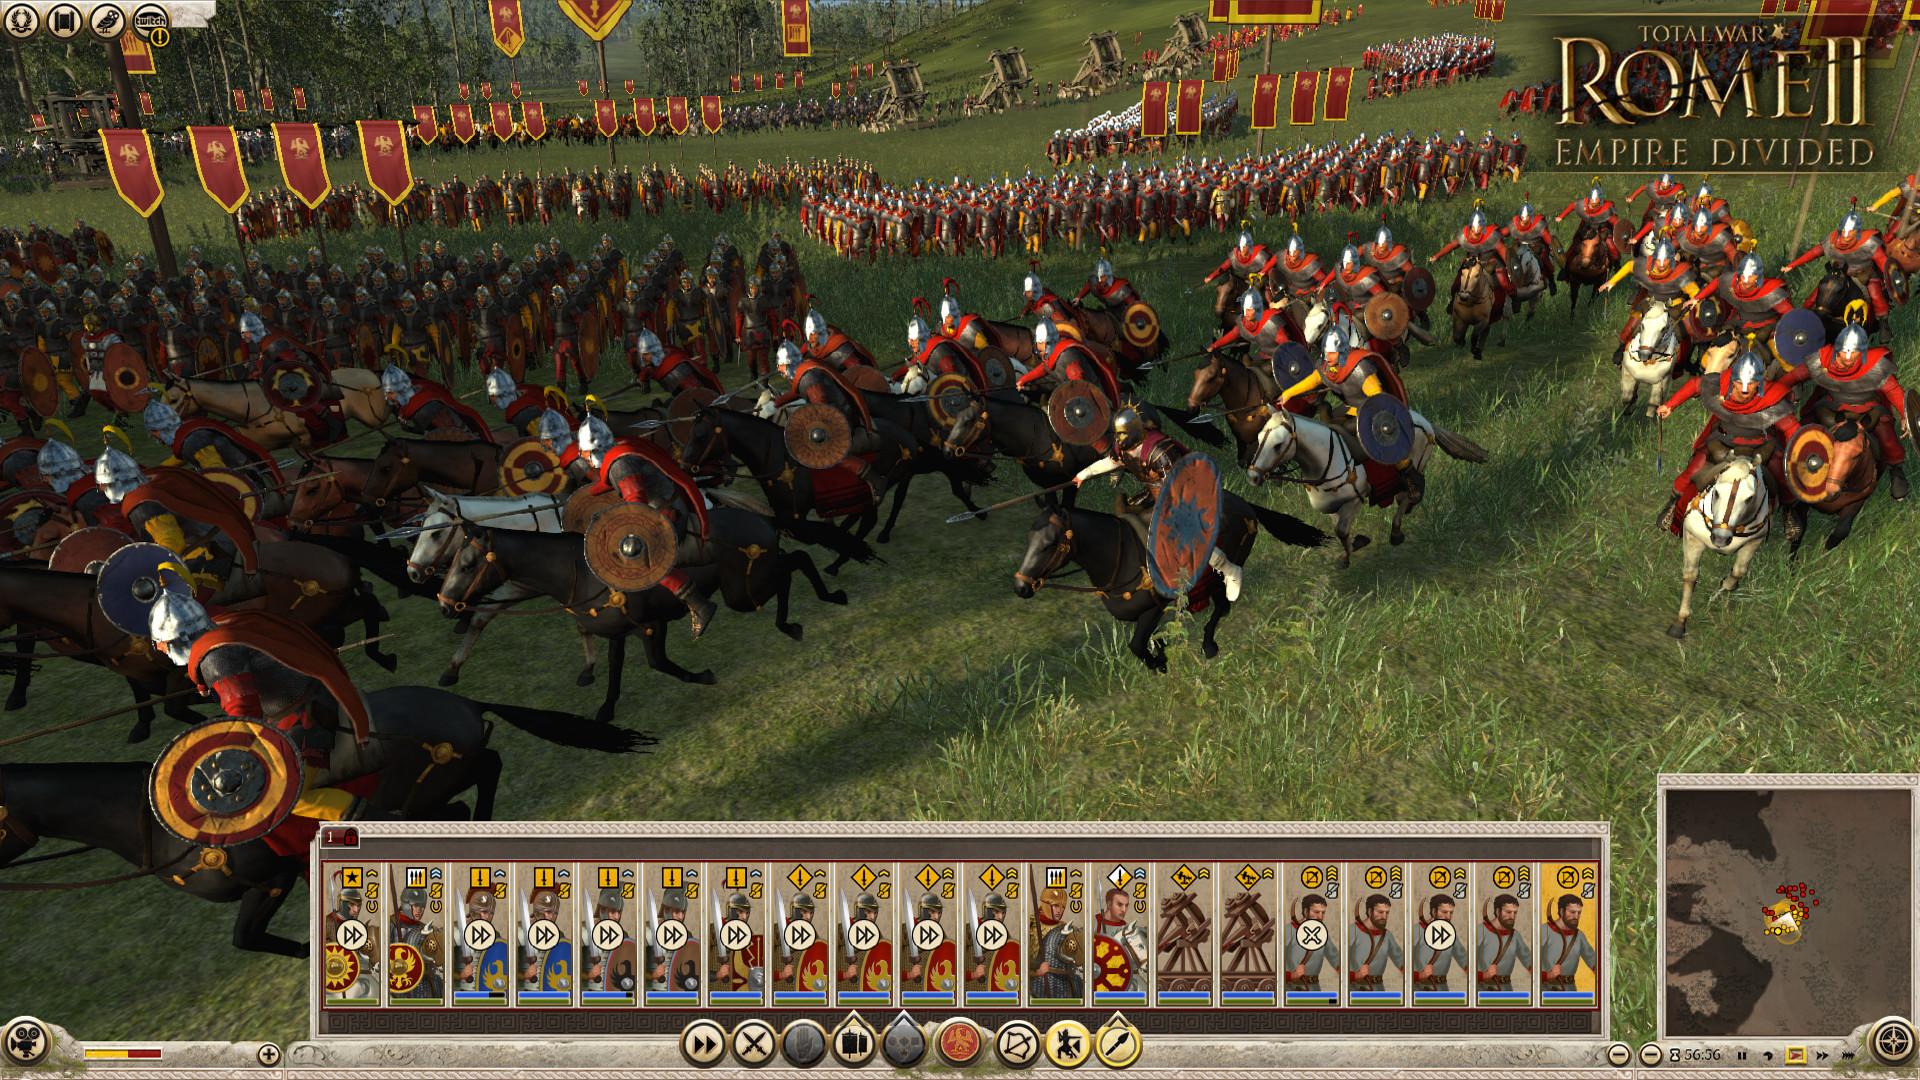 Total War: ROME II - Empire Divided Screenshot 1